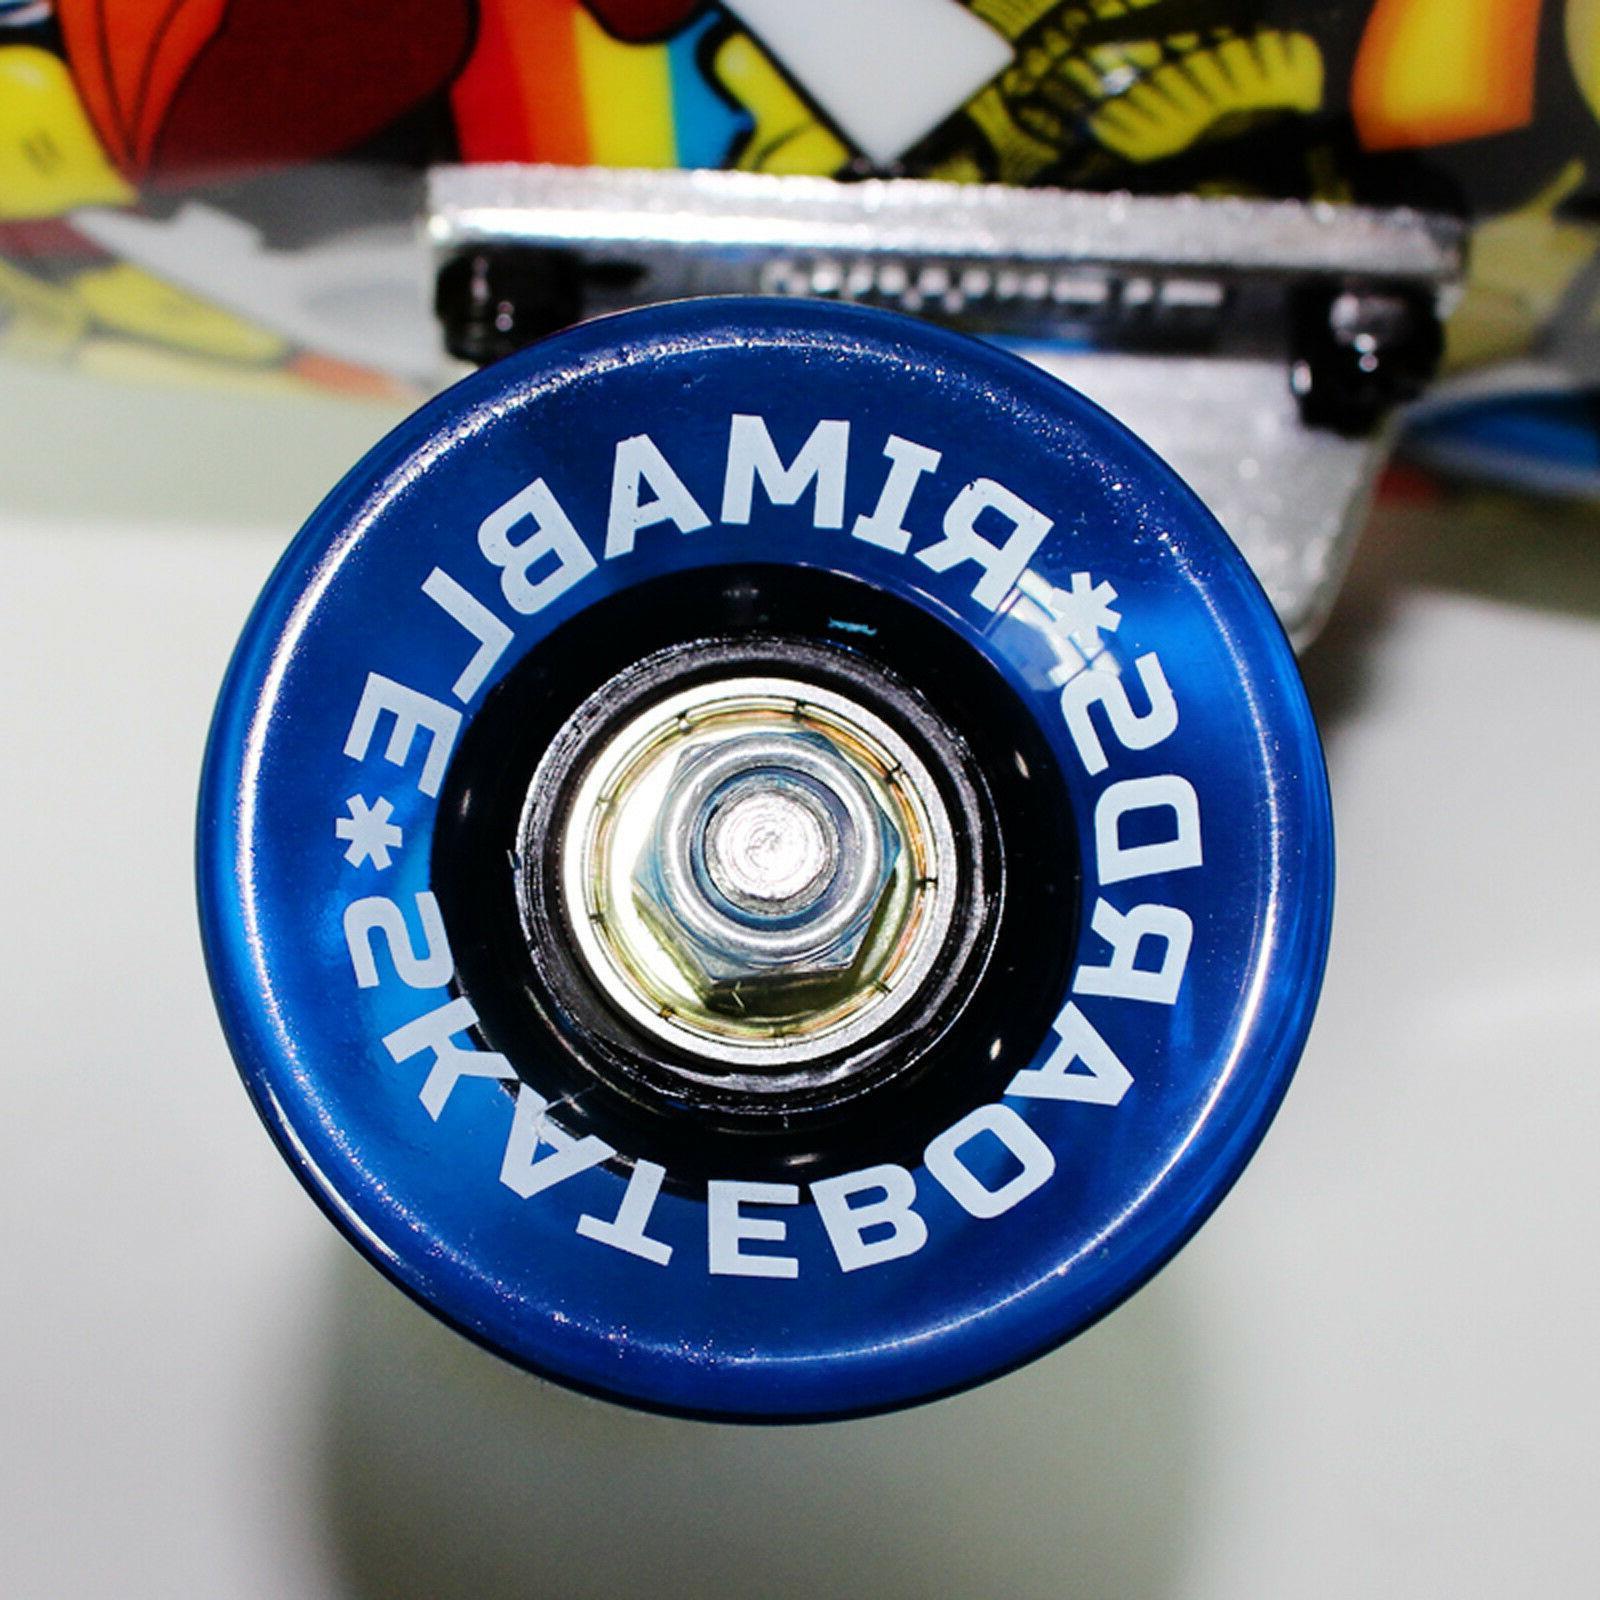 "Rimable 22"" Retro Cruiser Skateboard Penny Graphic"